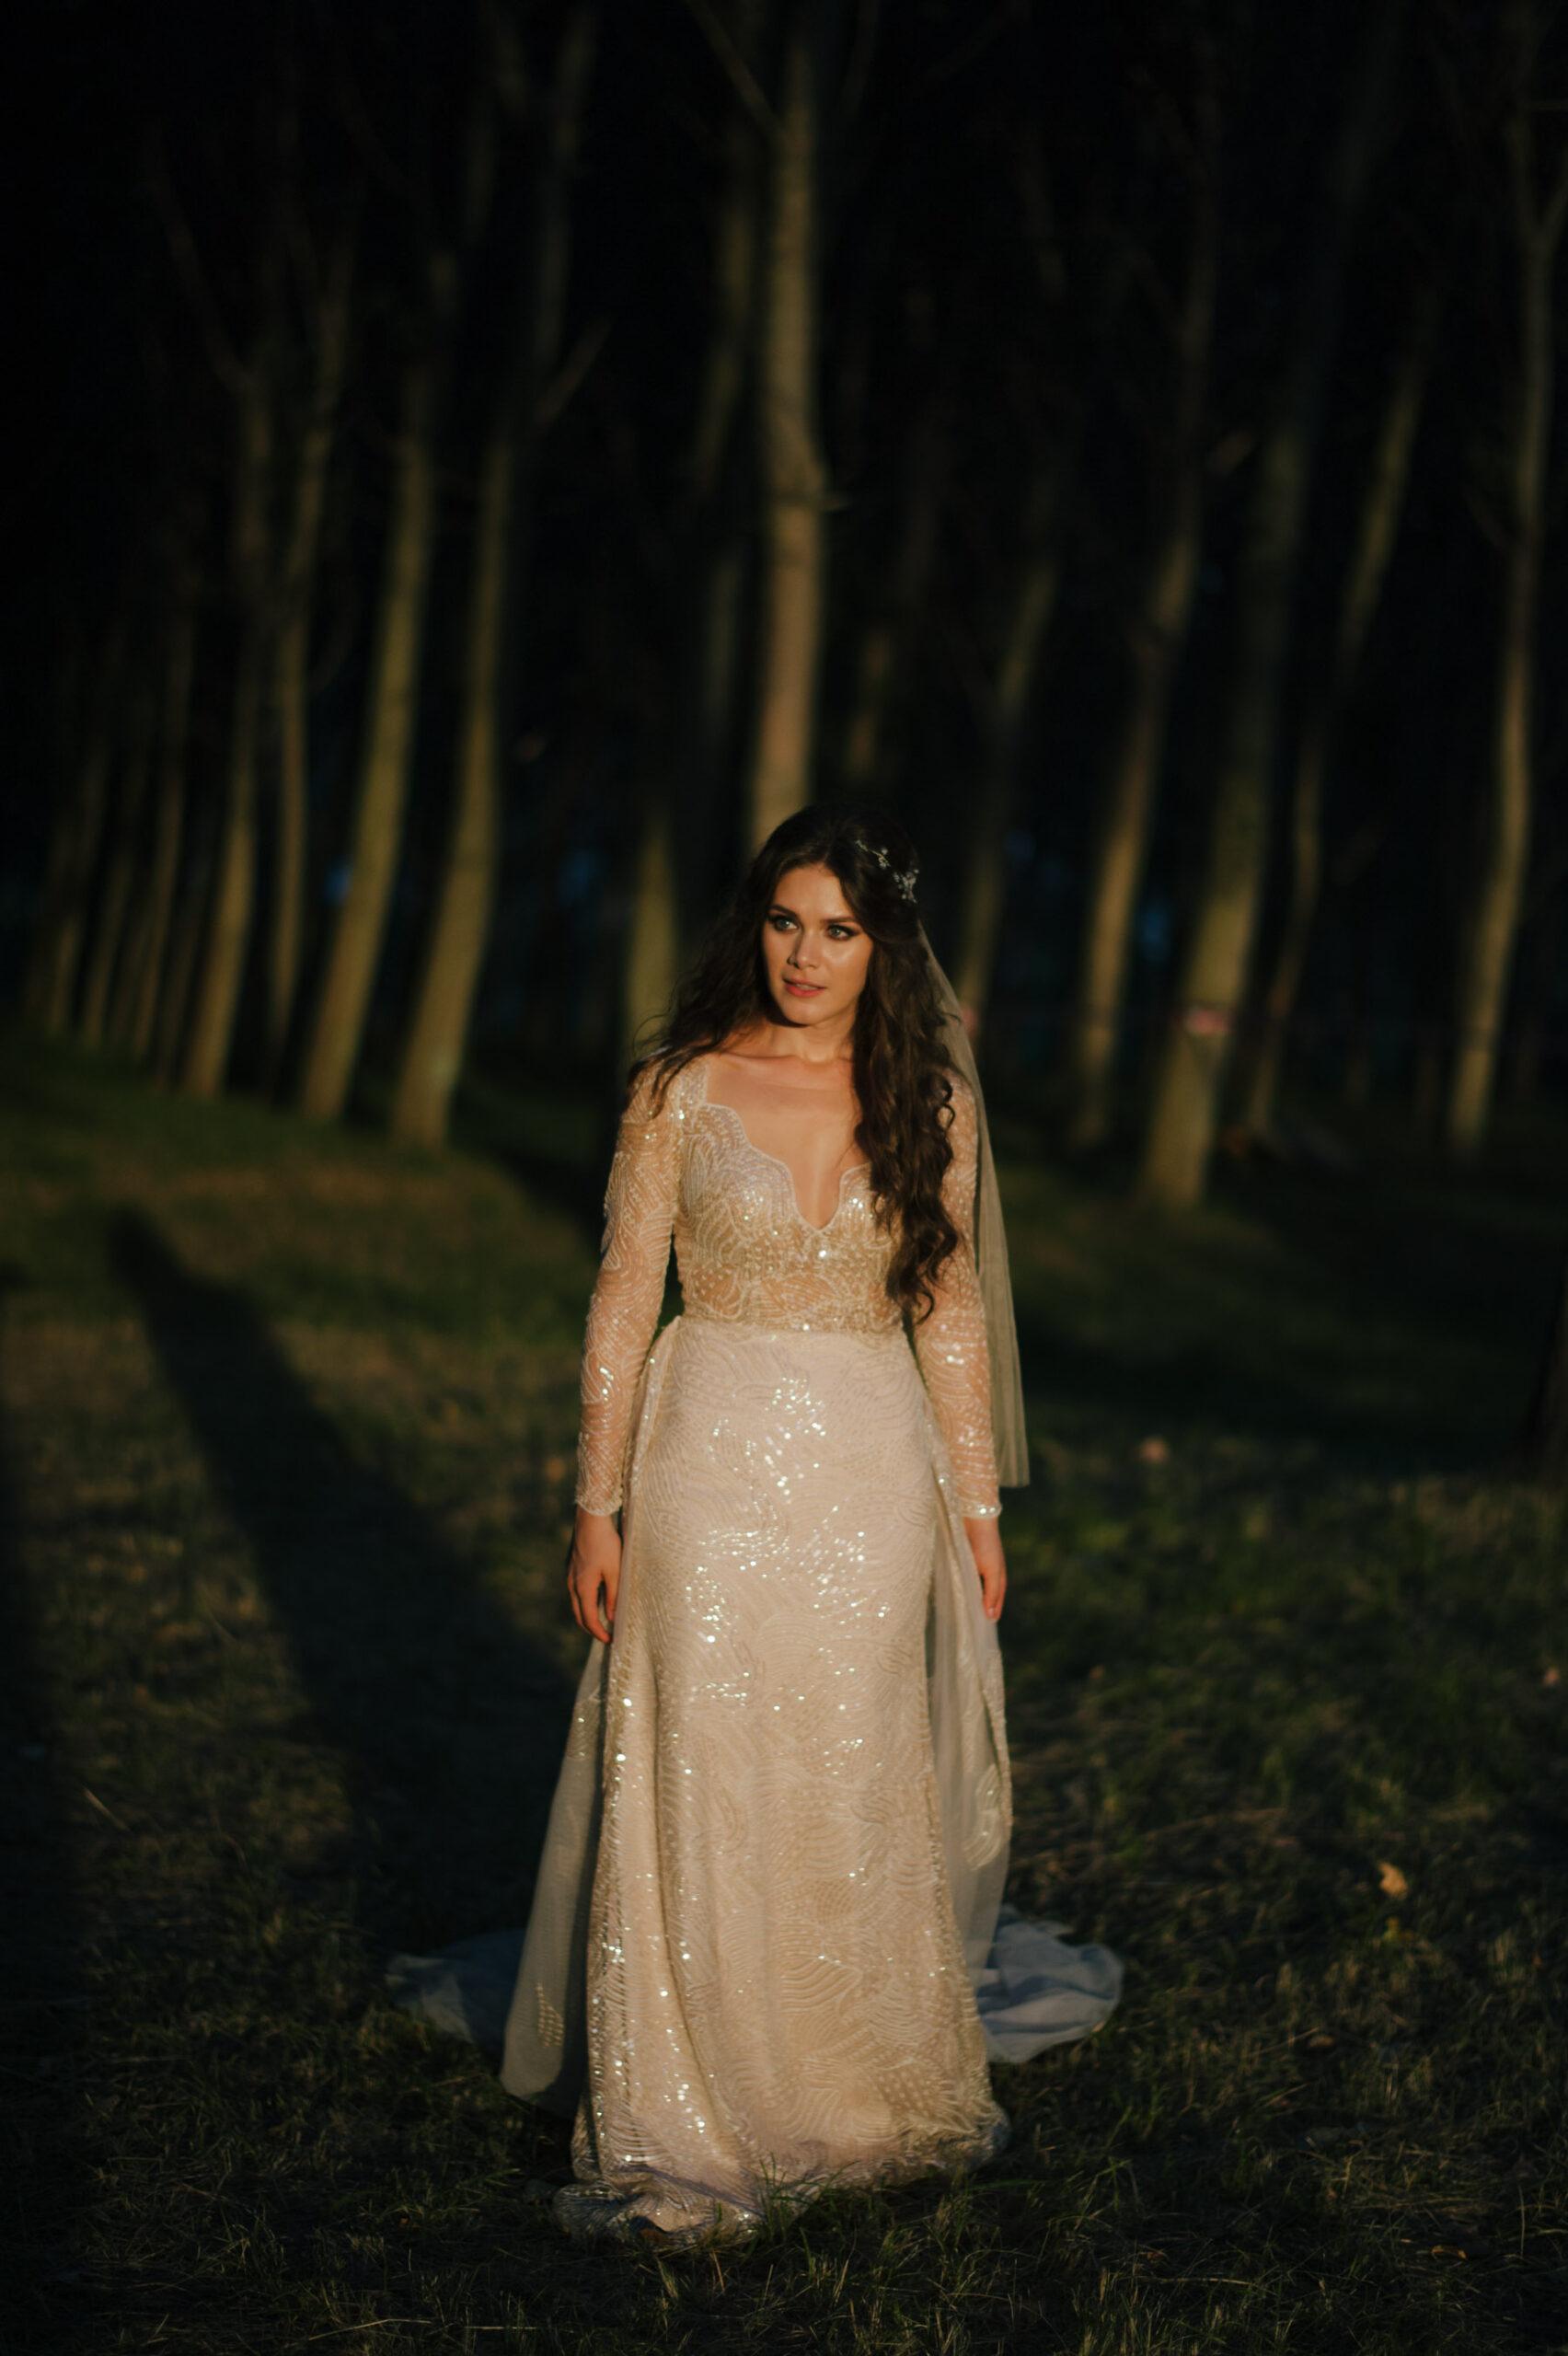 Bride Portrait Using Nikon 58 f1.4G